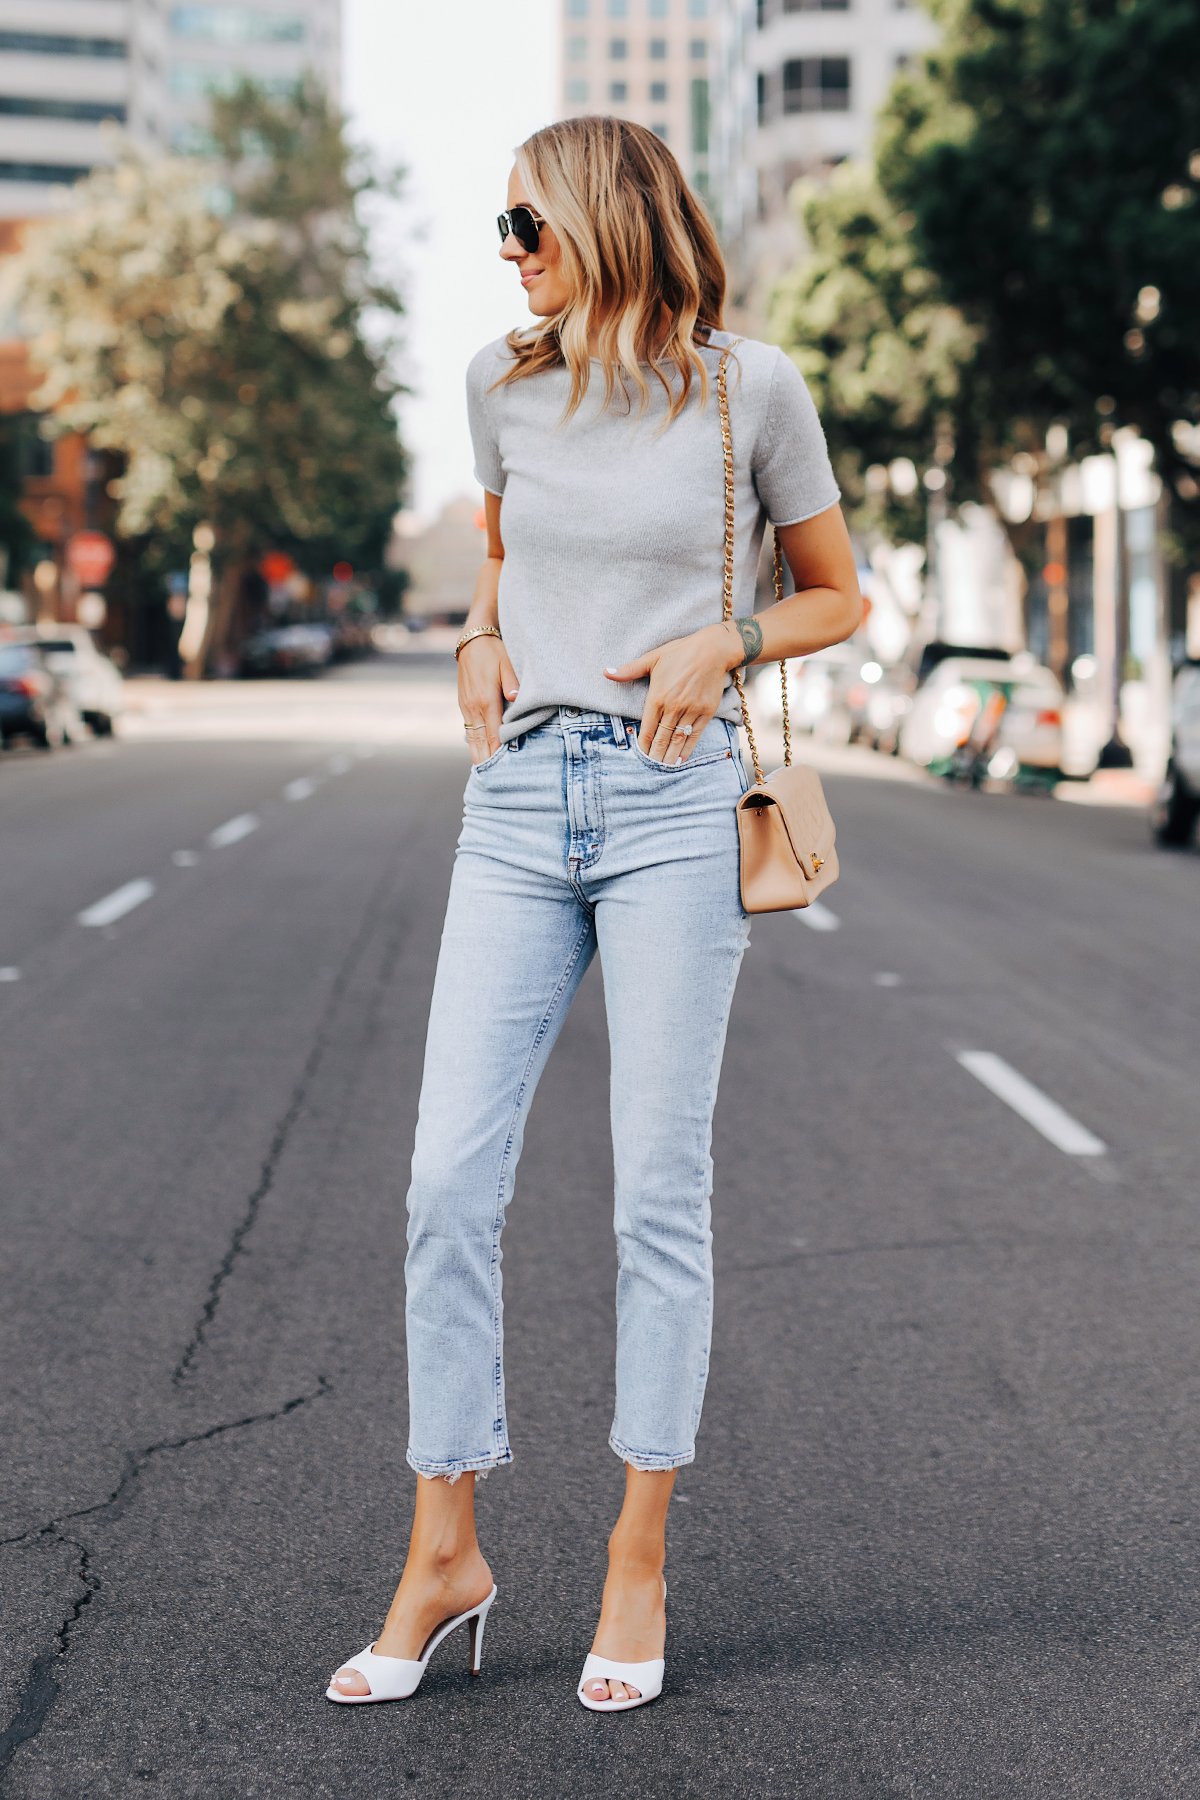 Fashion Jackson Wearing Theory Tolleree Short Sleeve Sweater Grey Abercrombie Straight Leg Jeans White Heels Chanel Beige Handbag 2